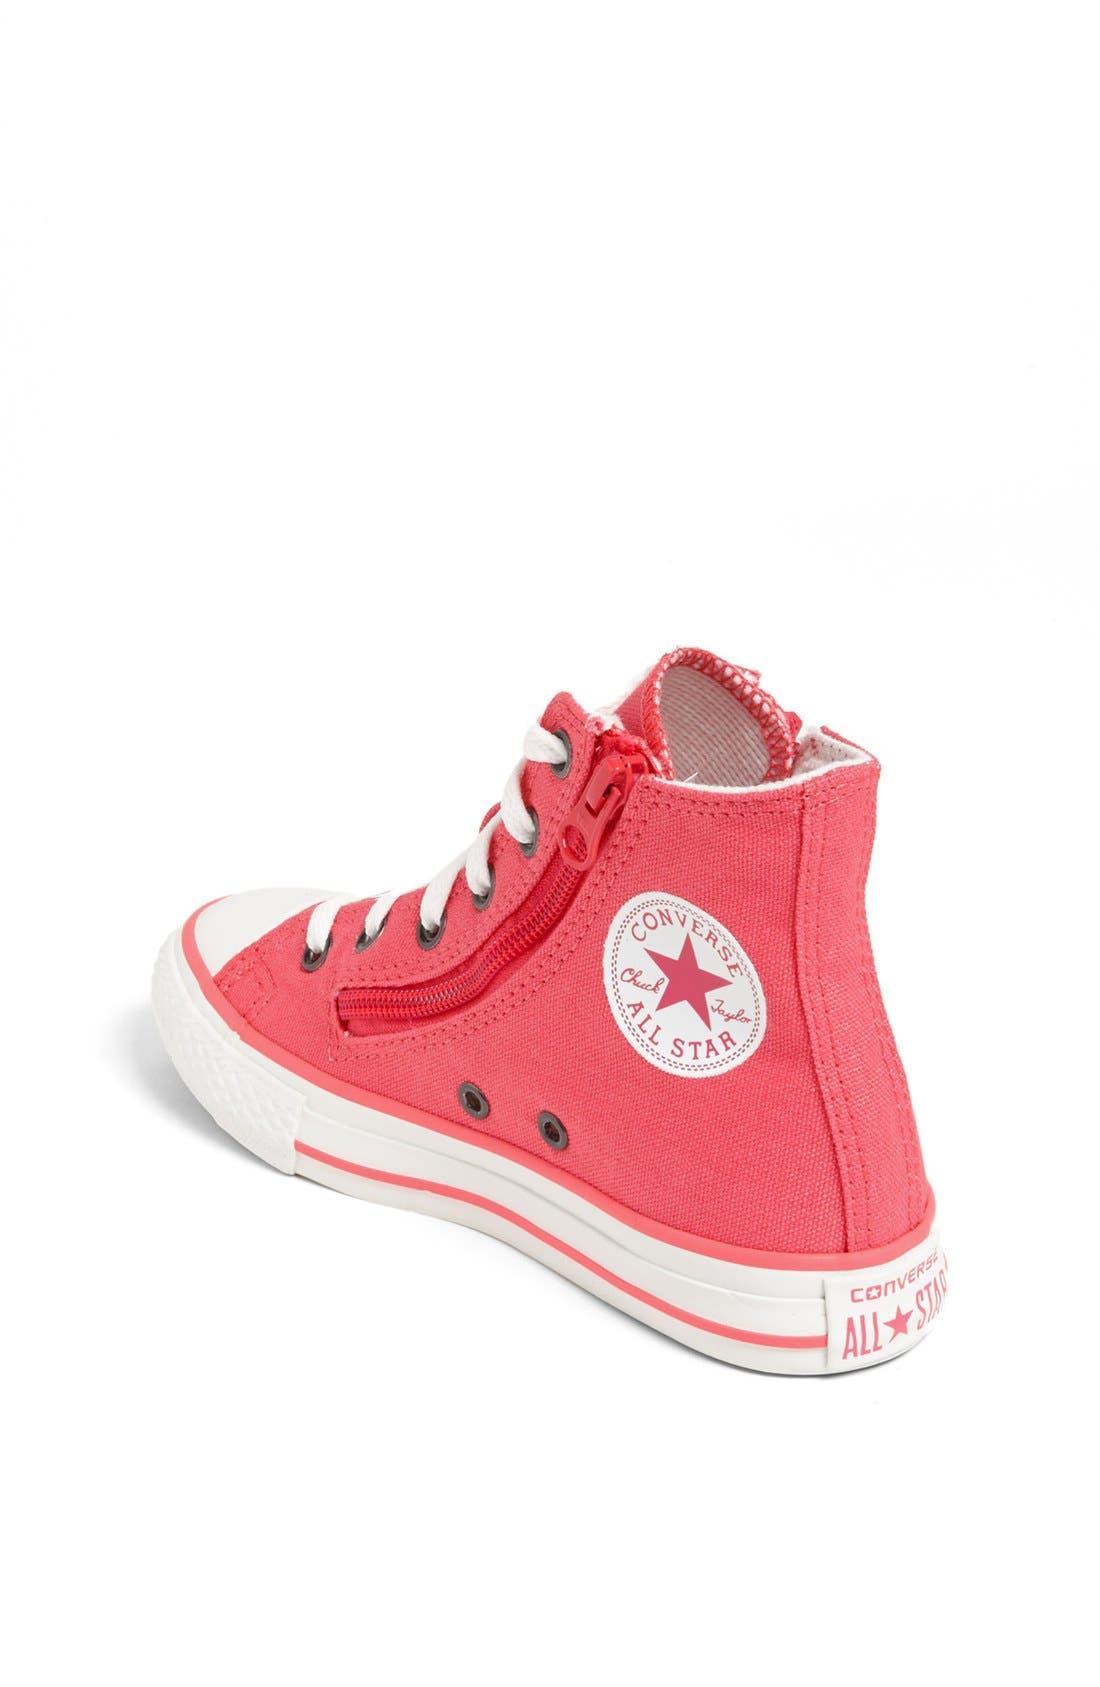 Alternate Image 2  - Converse Chuck Taylor® All Star® High Top Sneaker (Toddler, Little Kid & Big Kid)